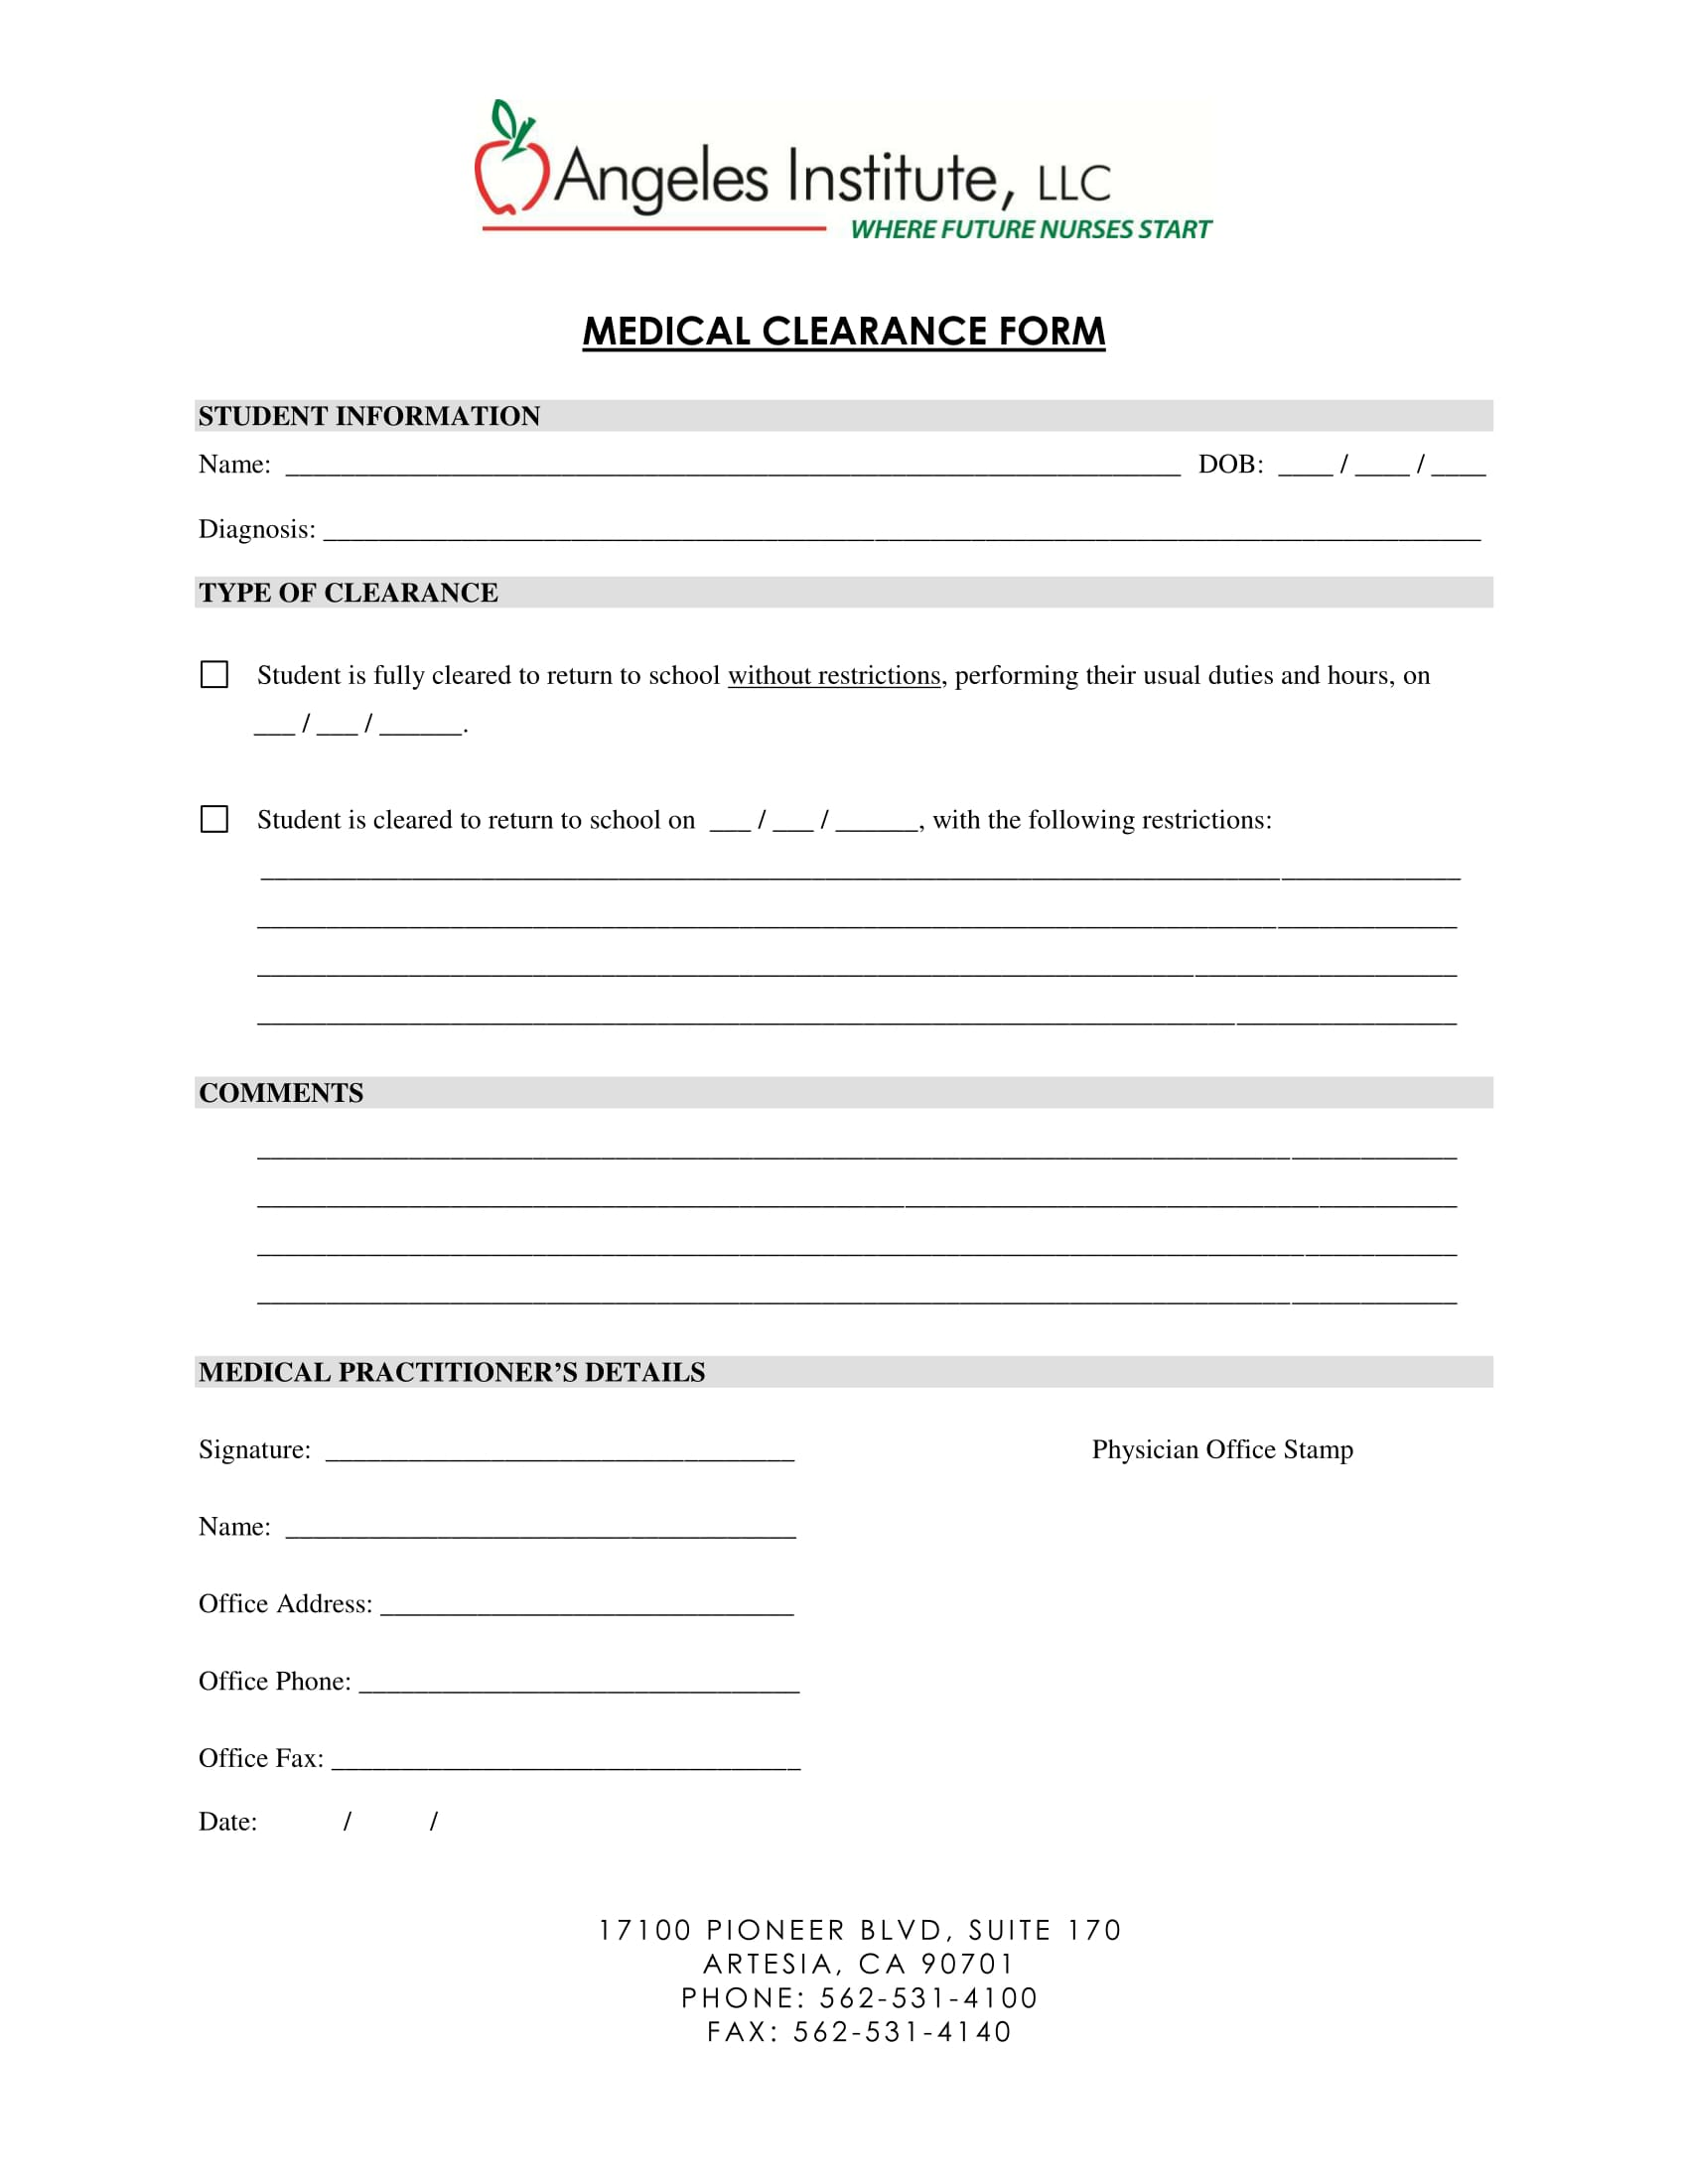 nurse institute medical clearance form 1